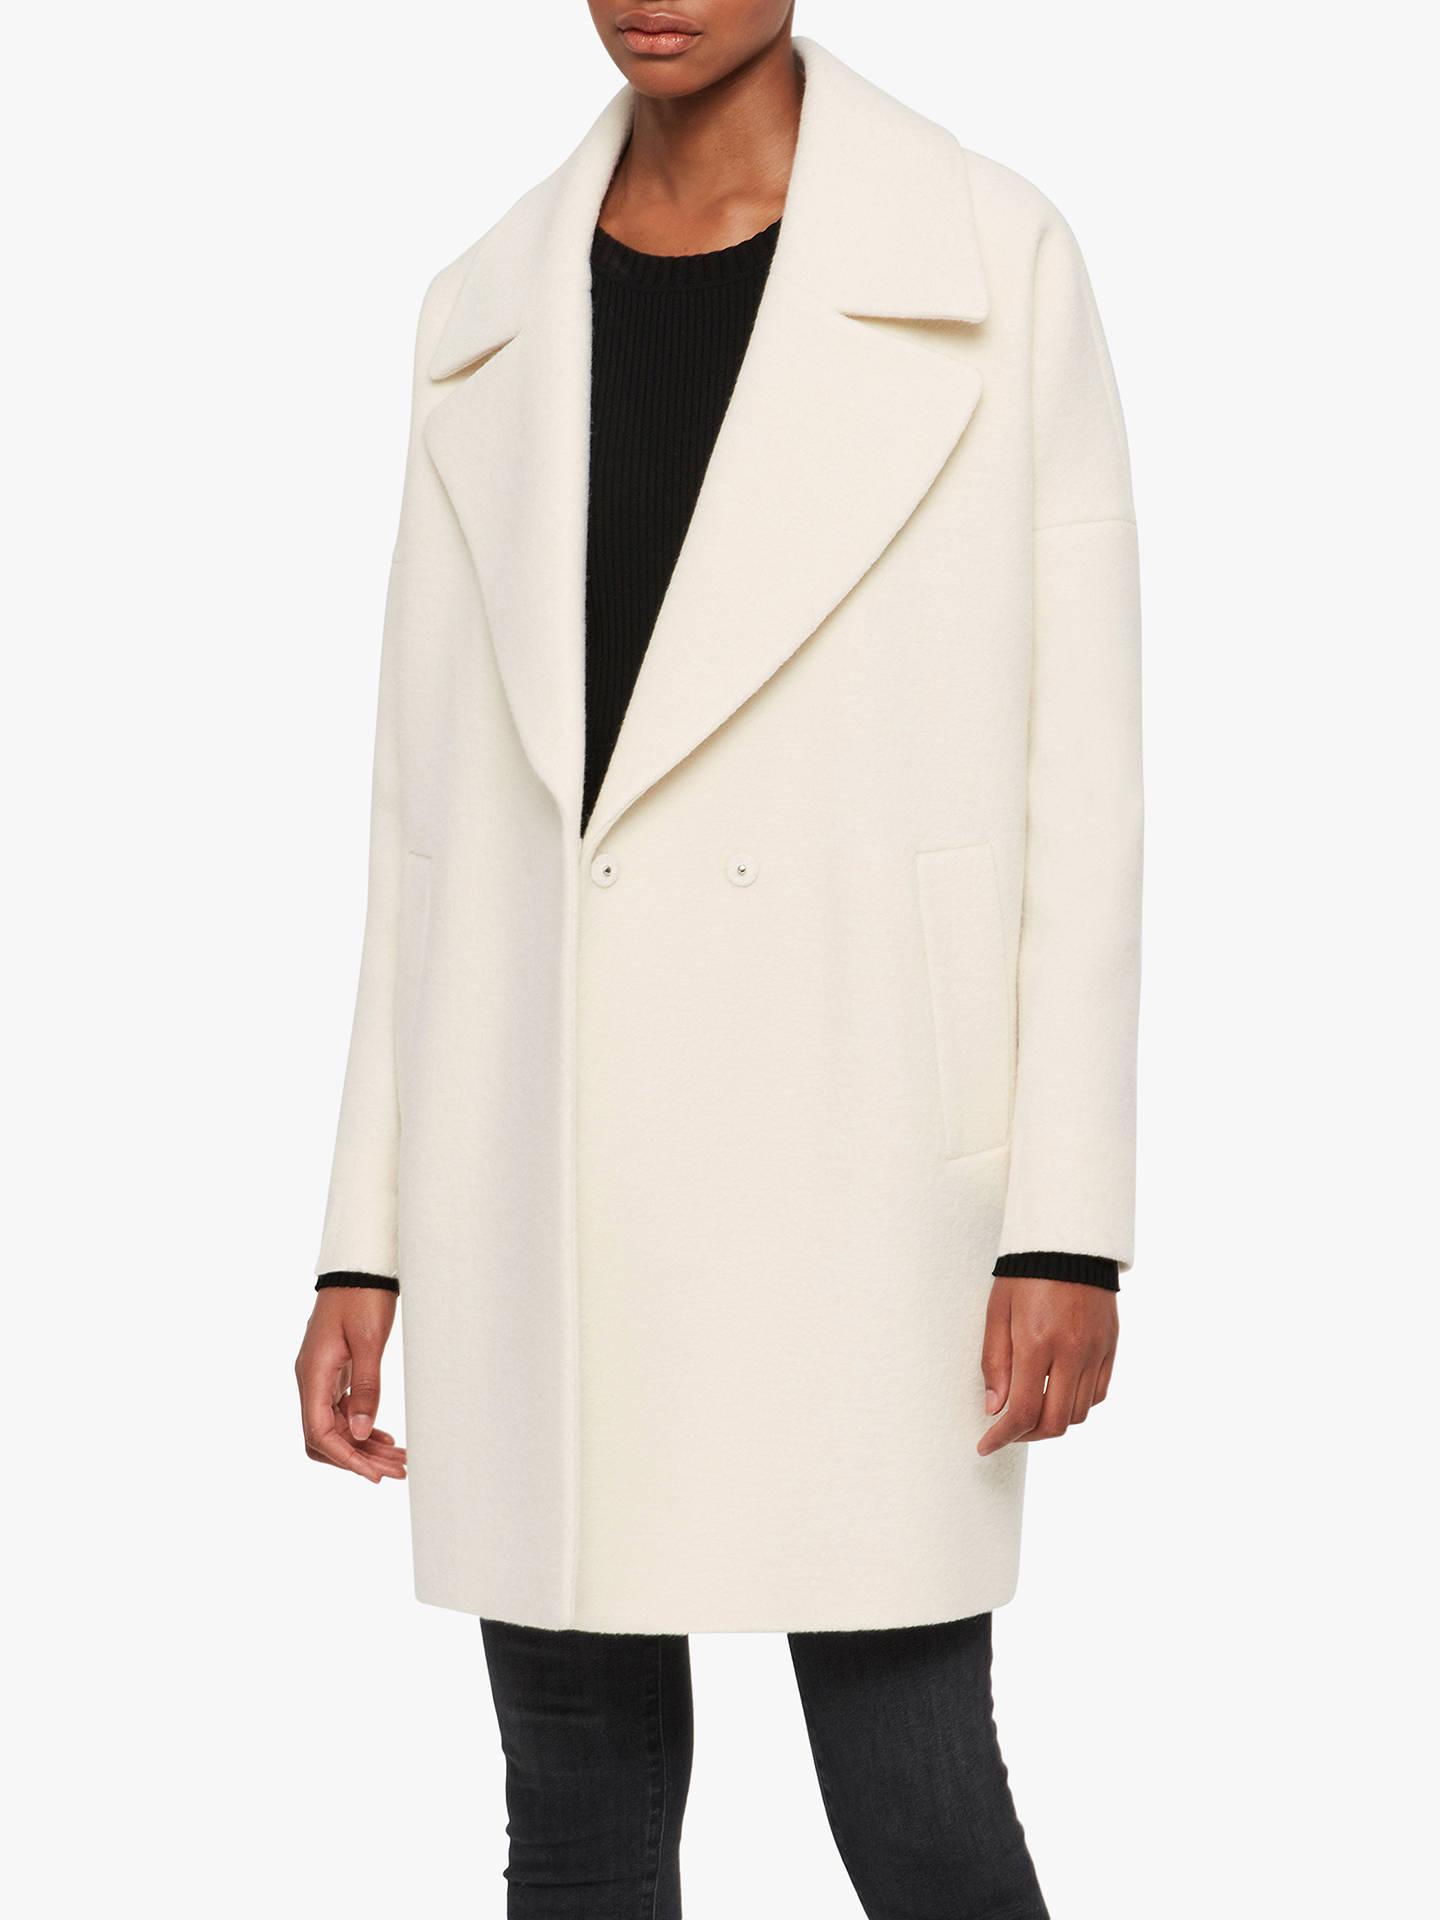 All Saints Jetta Coat, Ecru White by Allsaints